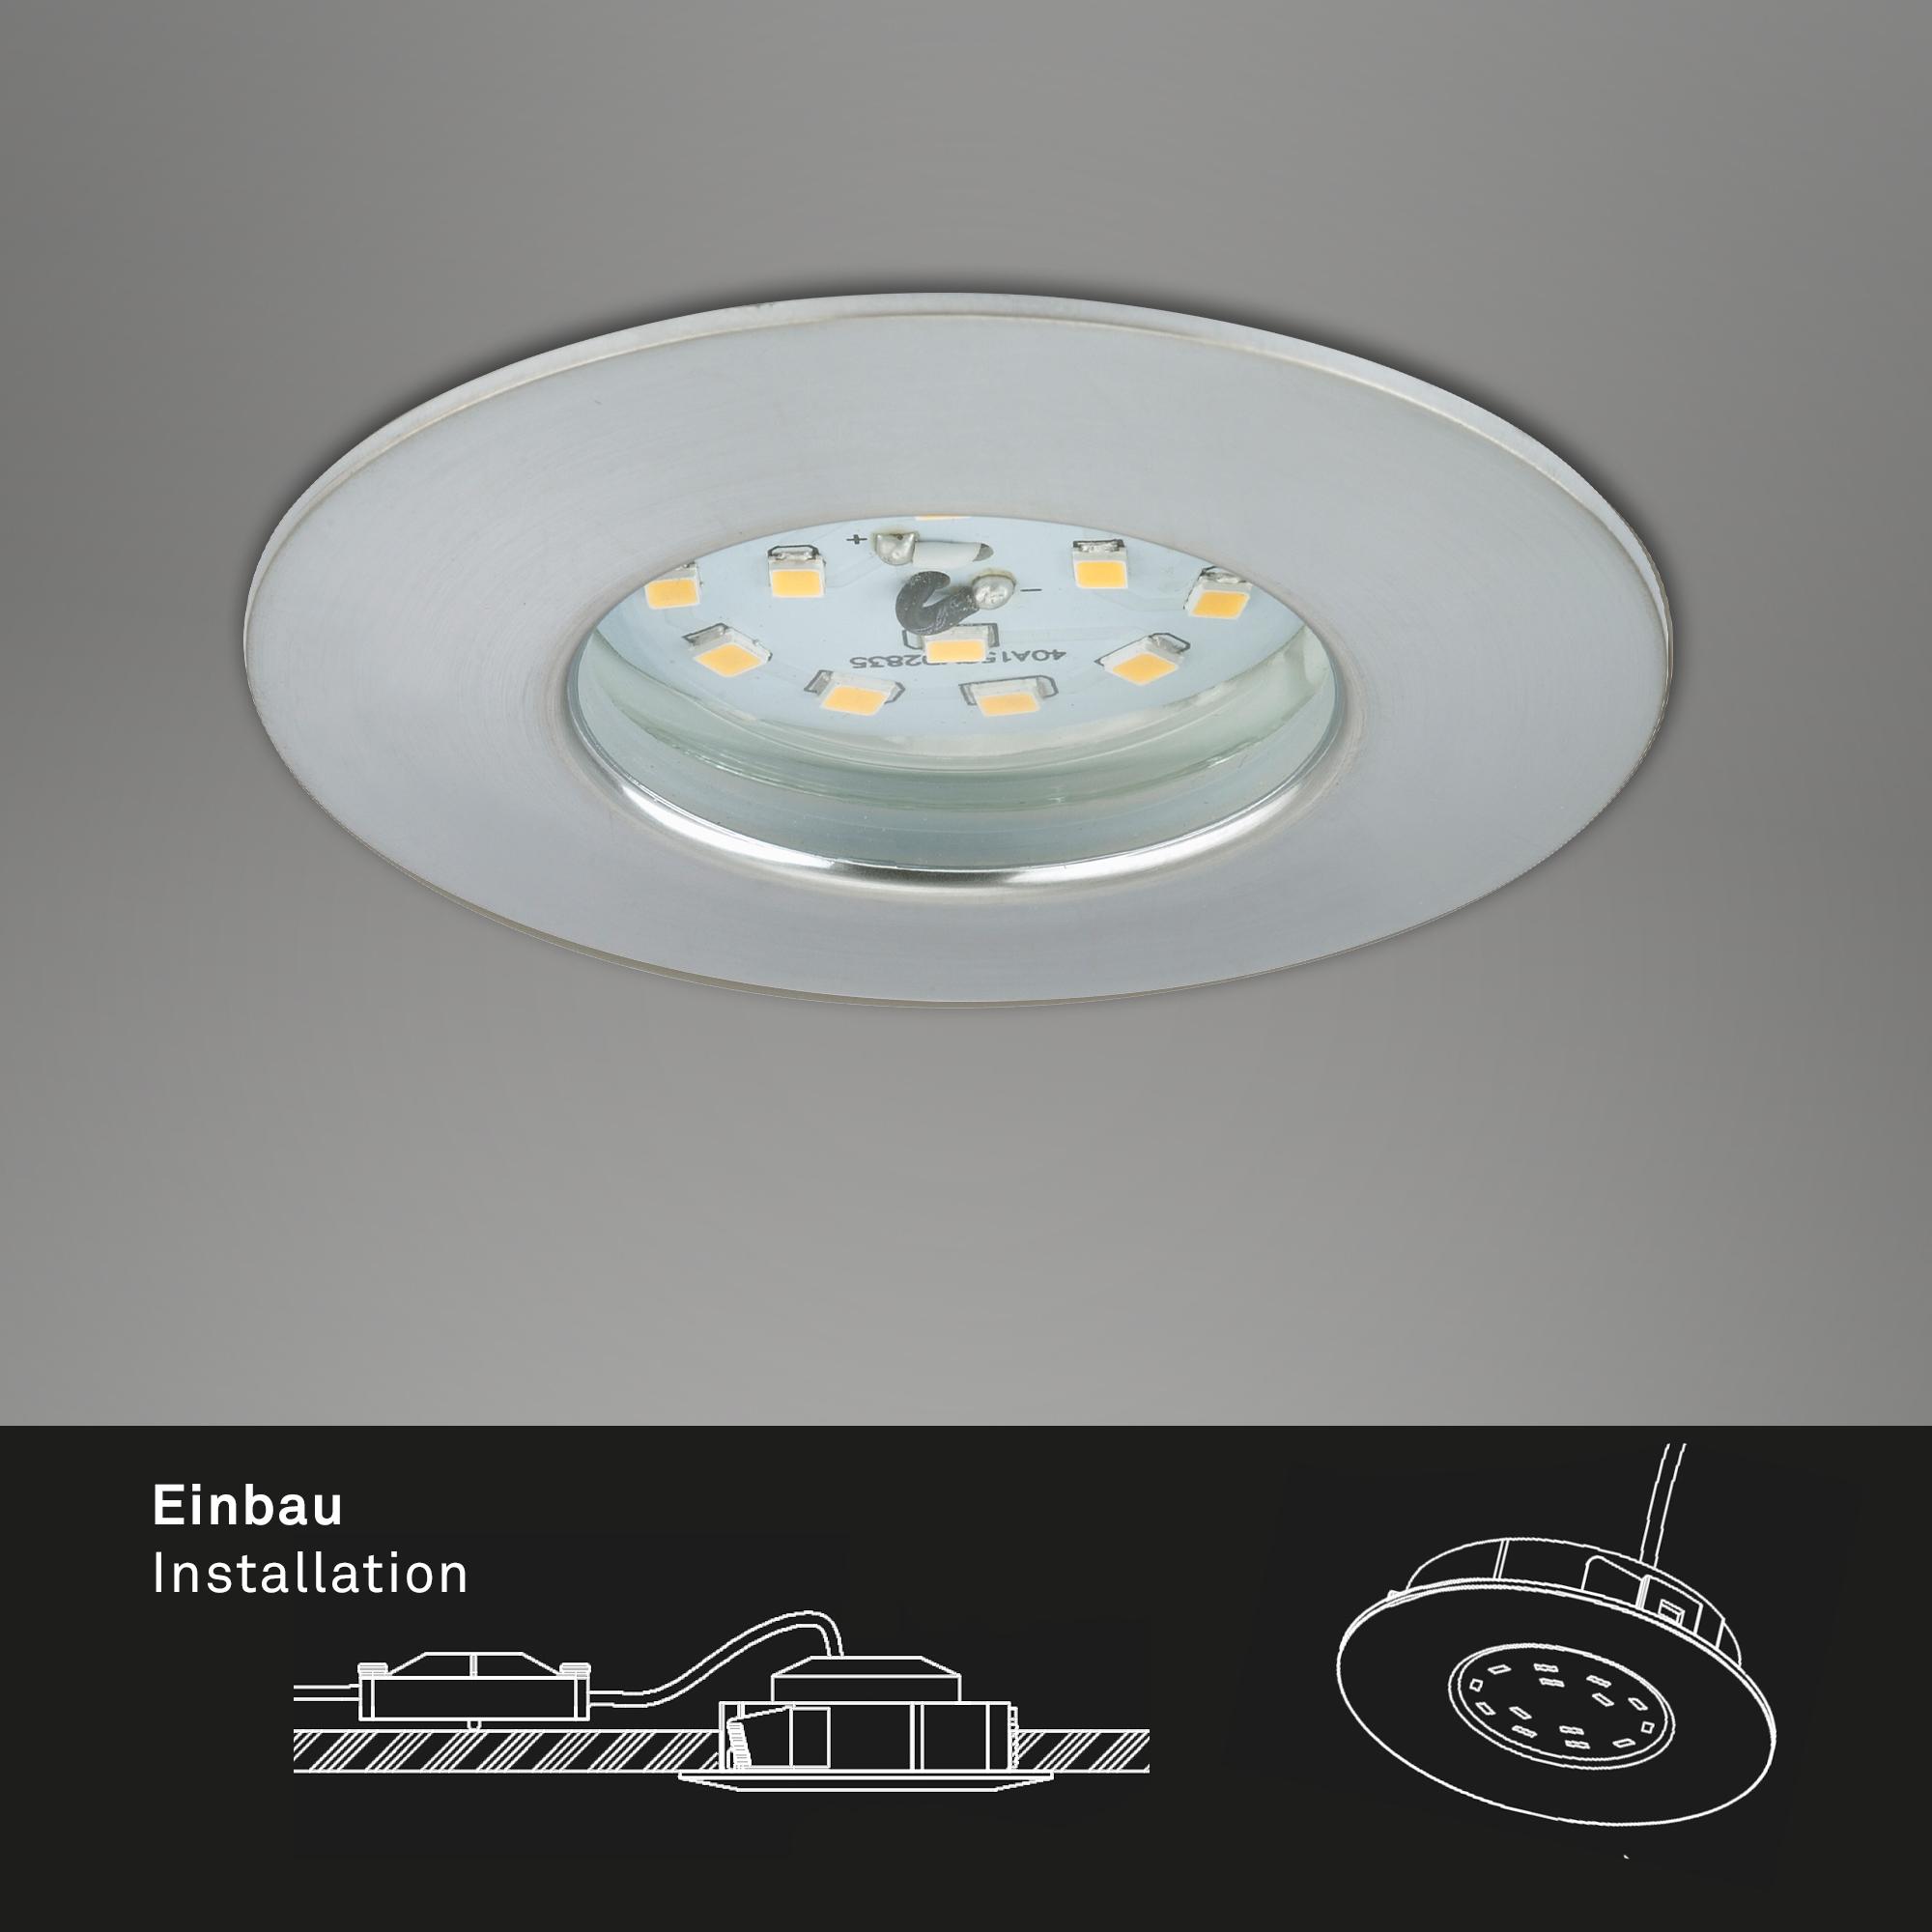 LED Einbauleuchte, Ø 7,5 cm, 6,5 W, Alu